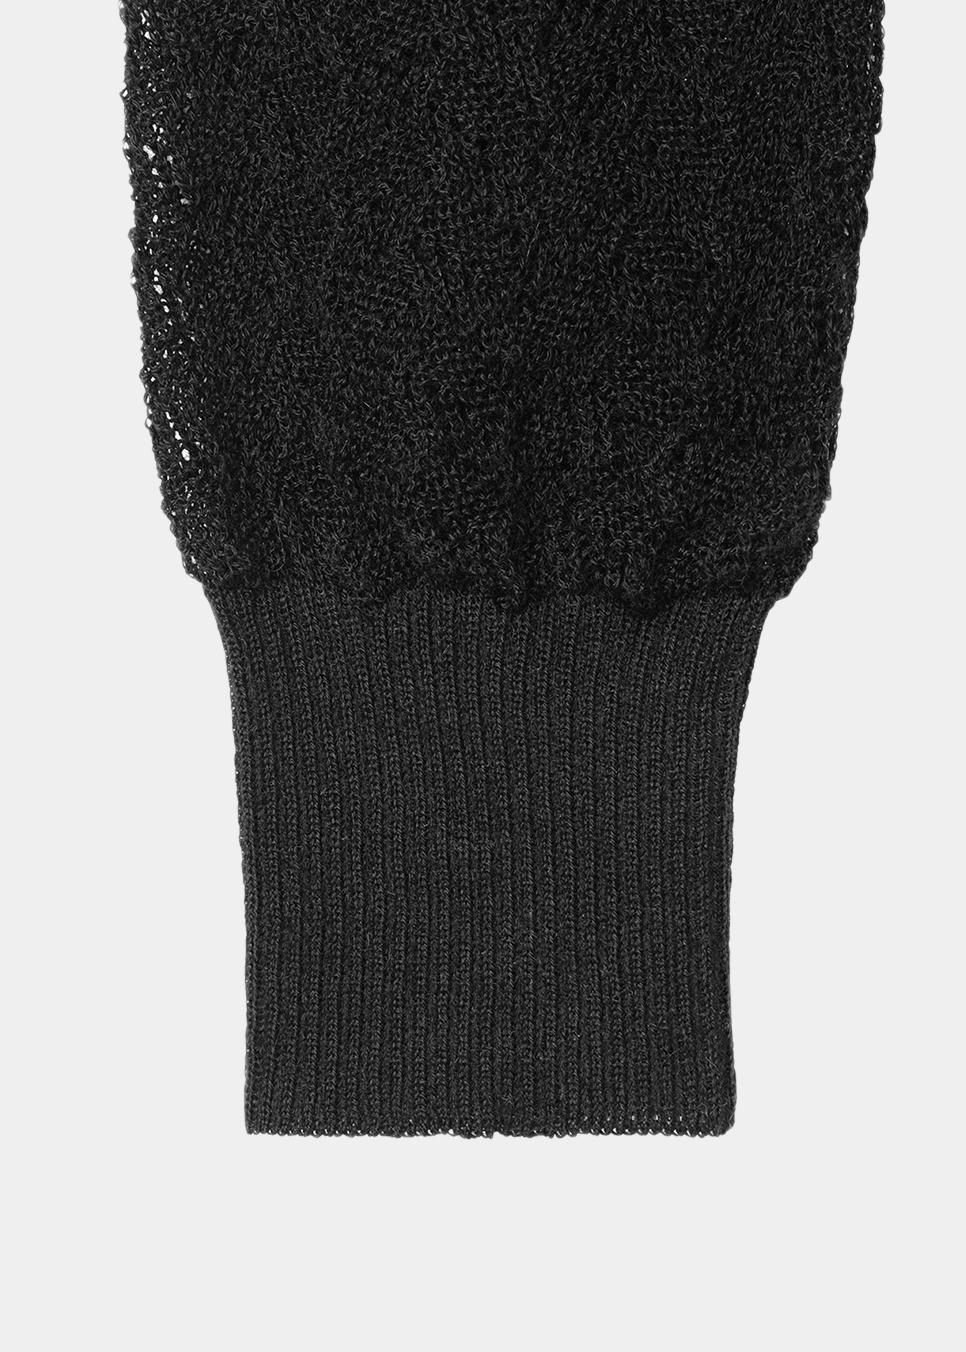 Knits - Shapiro Knit Blouse Thumbnail